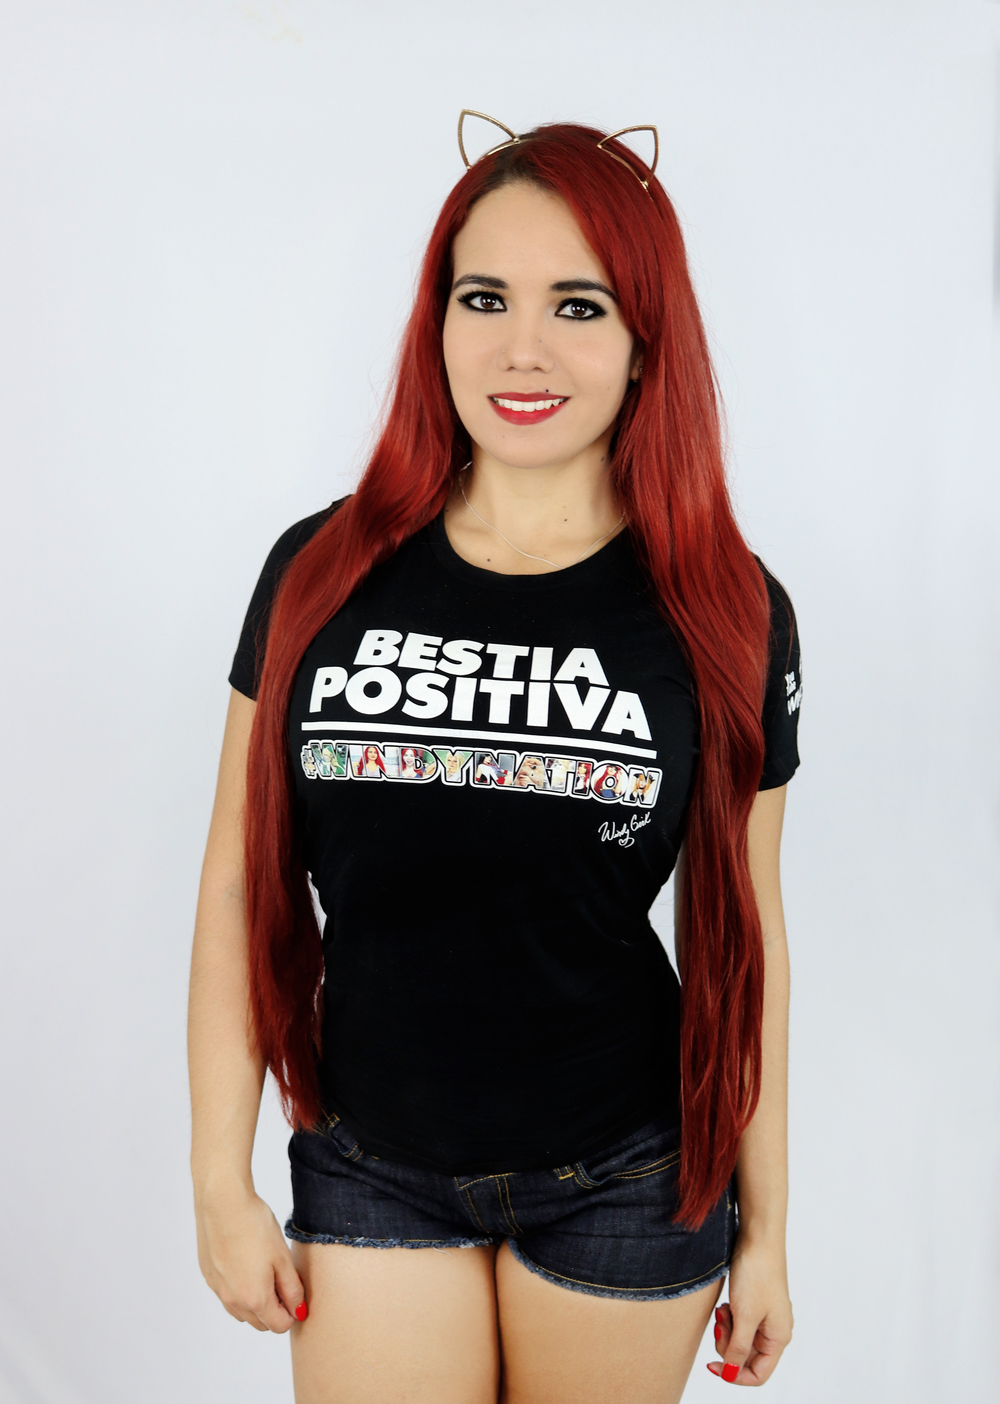 WindyGirk Bestia Positiva Collection